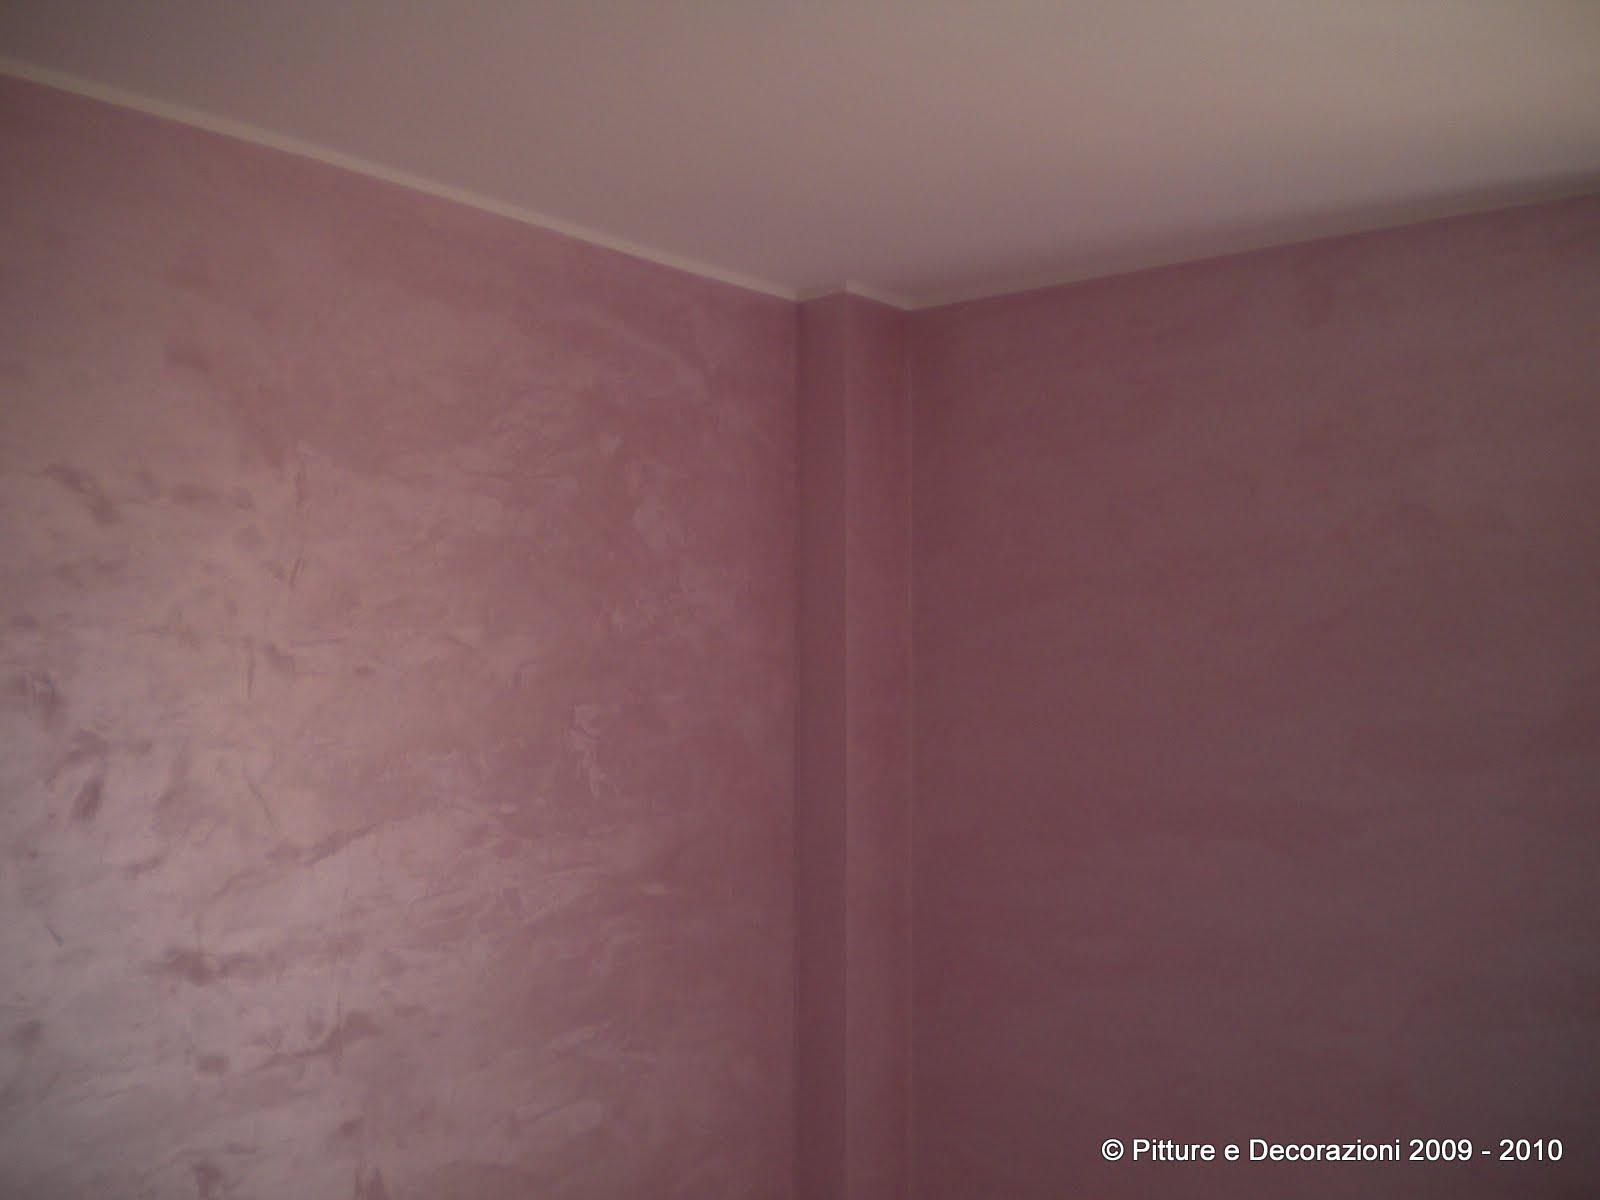 Pitture Murali Moderne Per Interni.Pittura Murale Per Interni Colorata Top Decorazioni Con Pittura